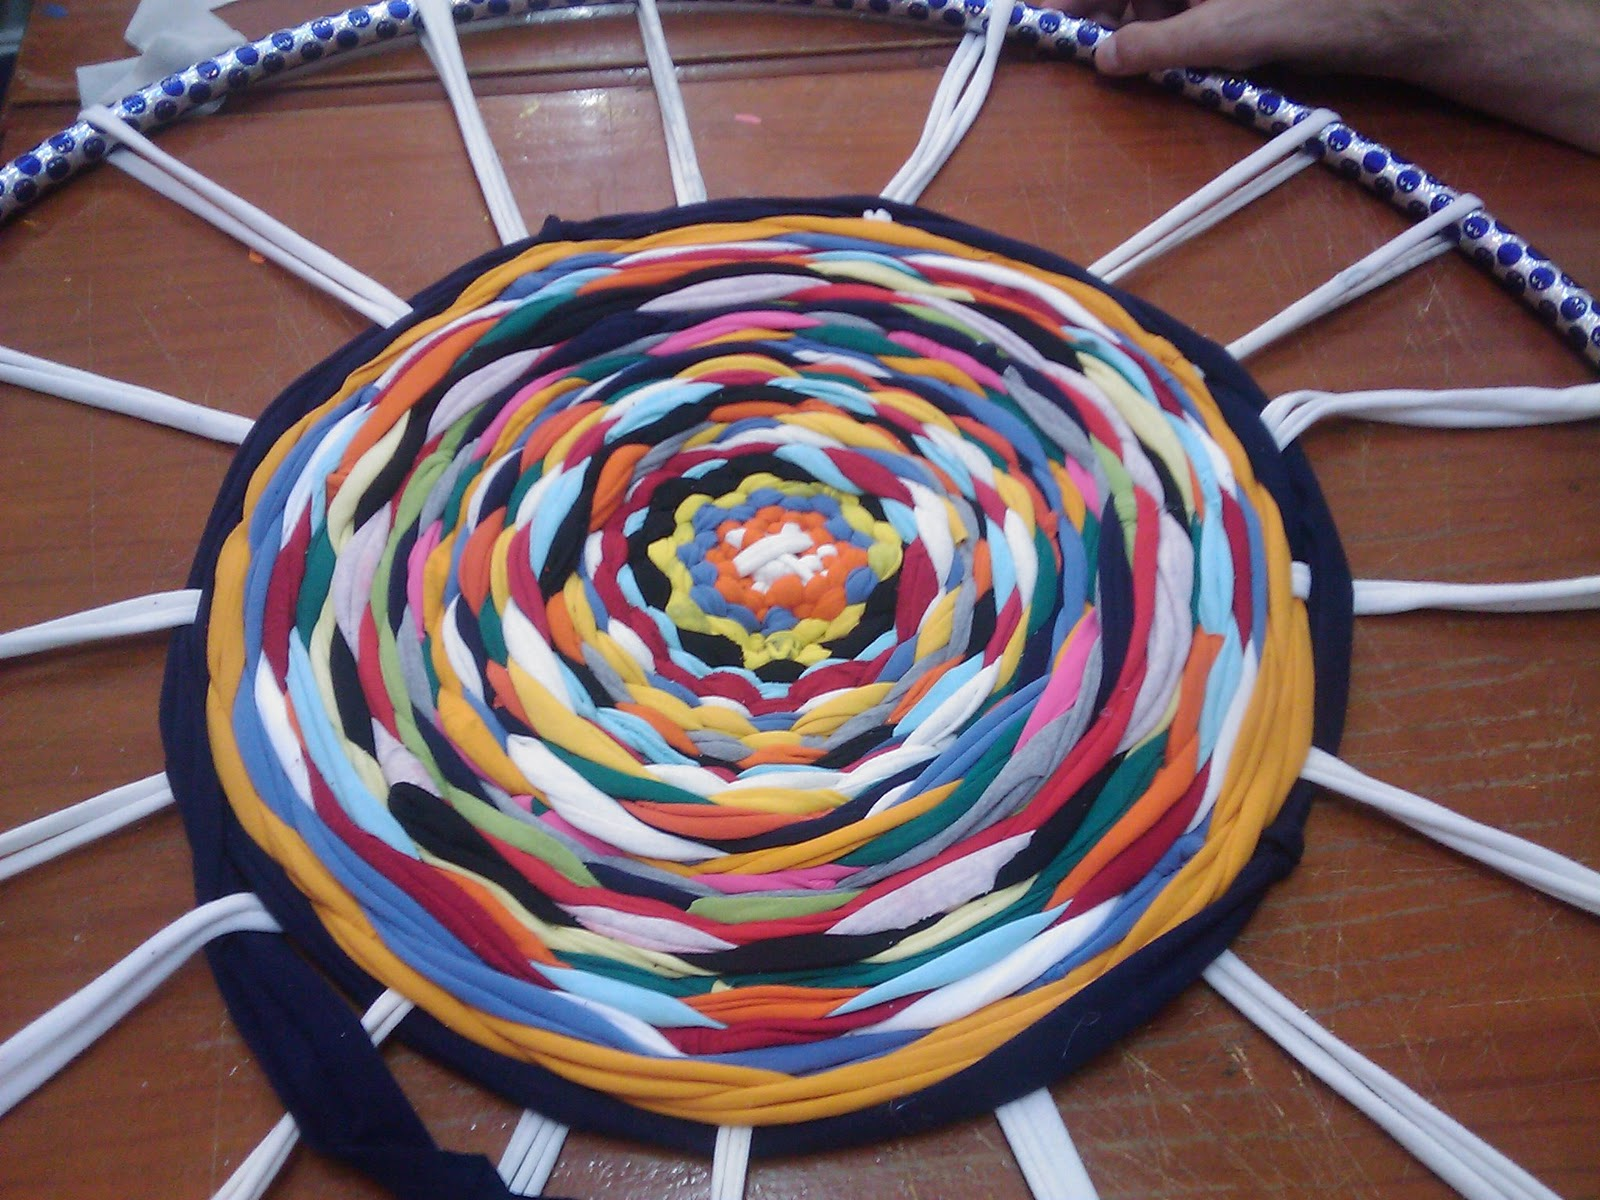 Adial taller de alfombras recicladas for Alfombras usadas